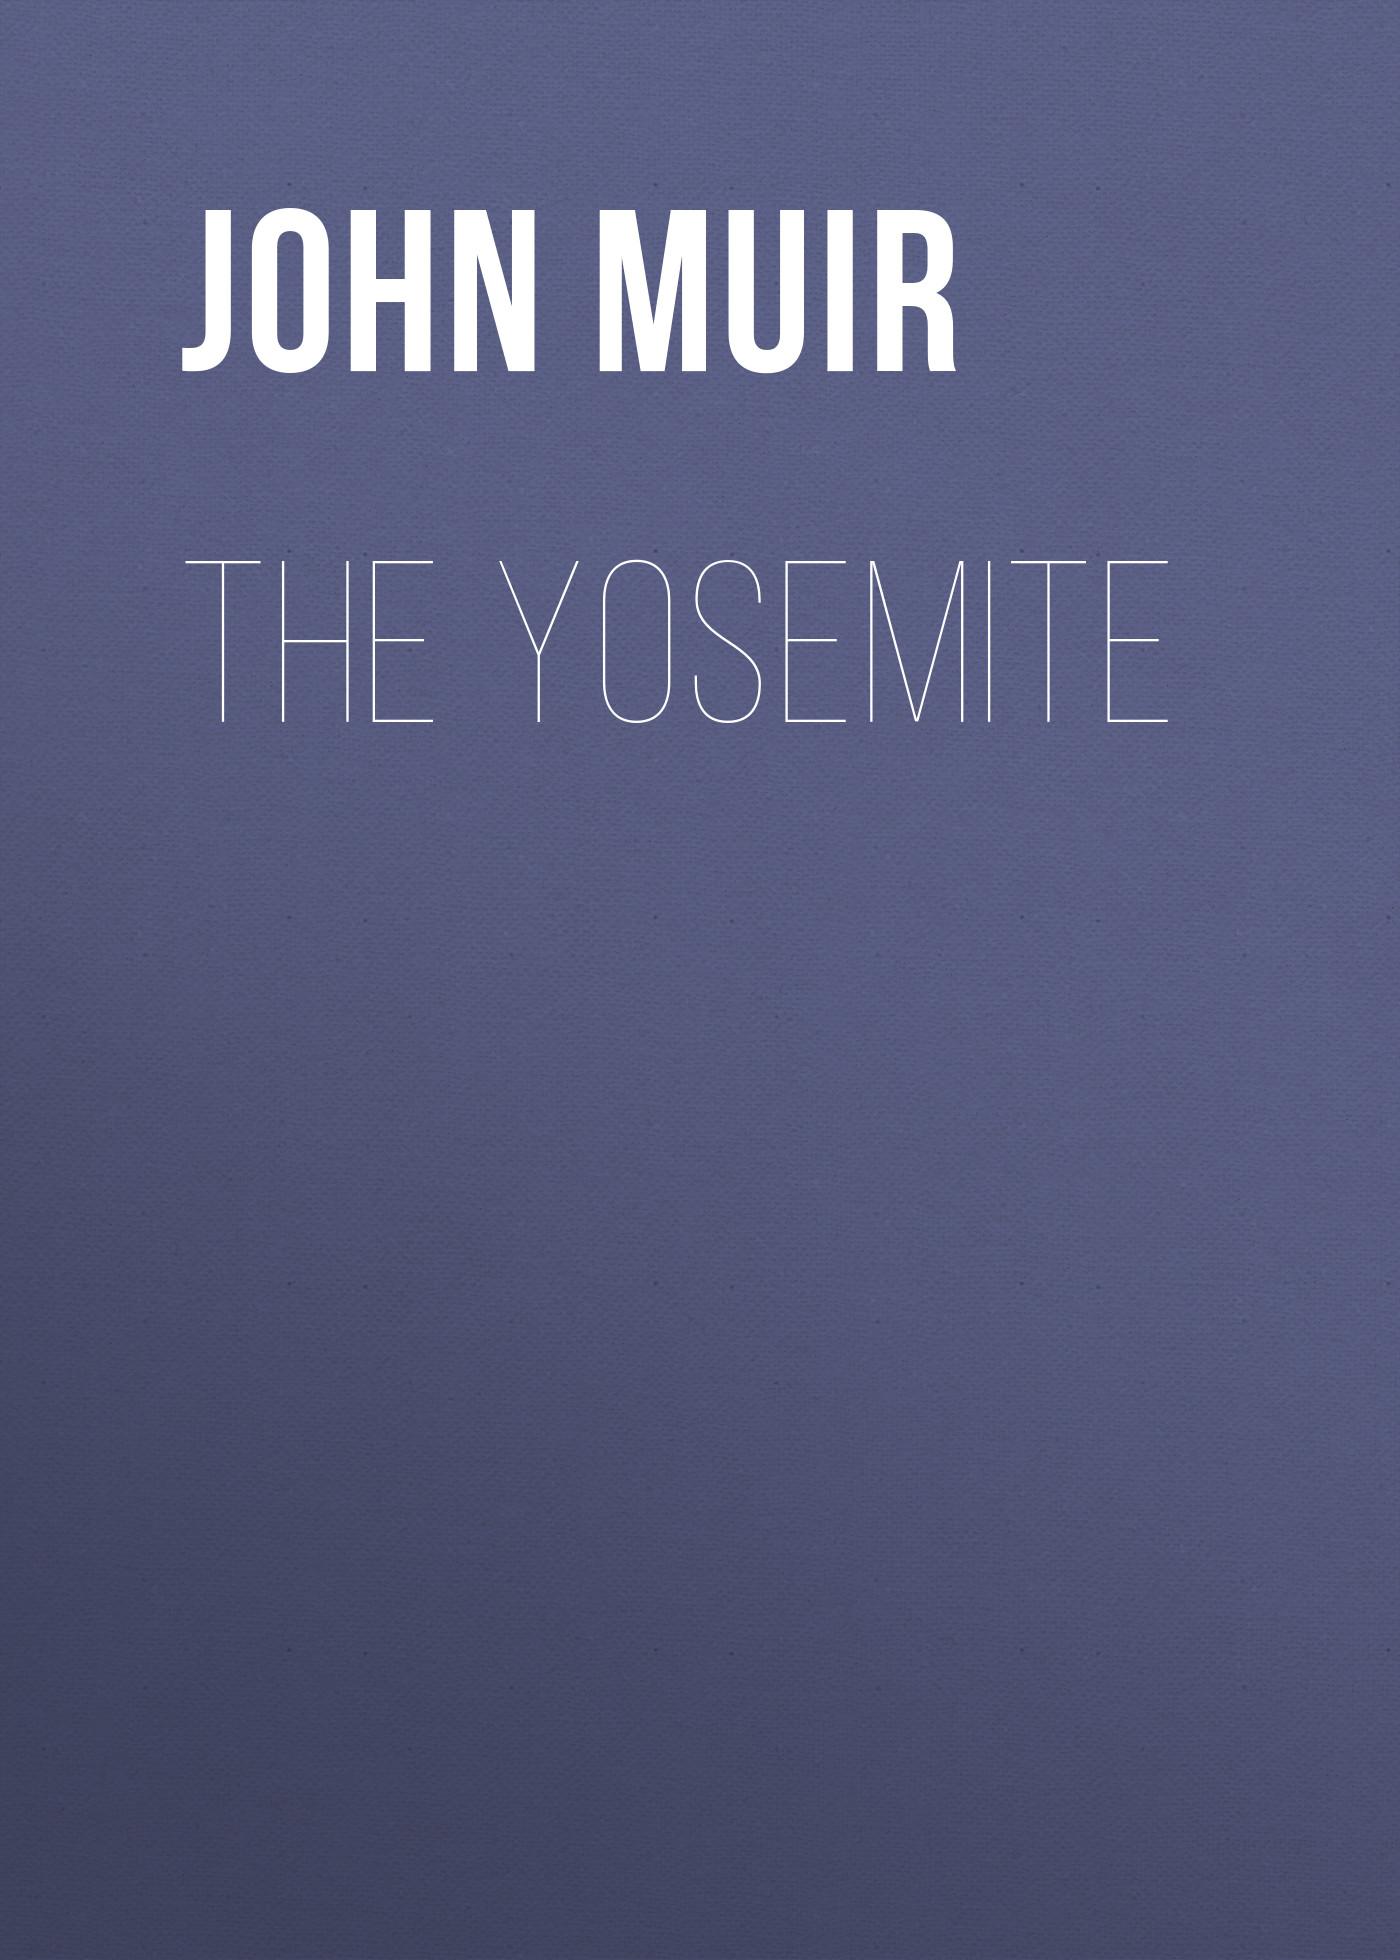 цена на John Muir The Yosemite